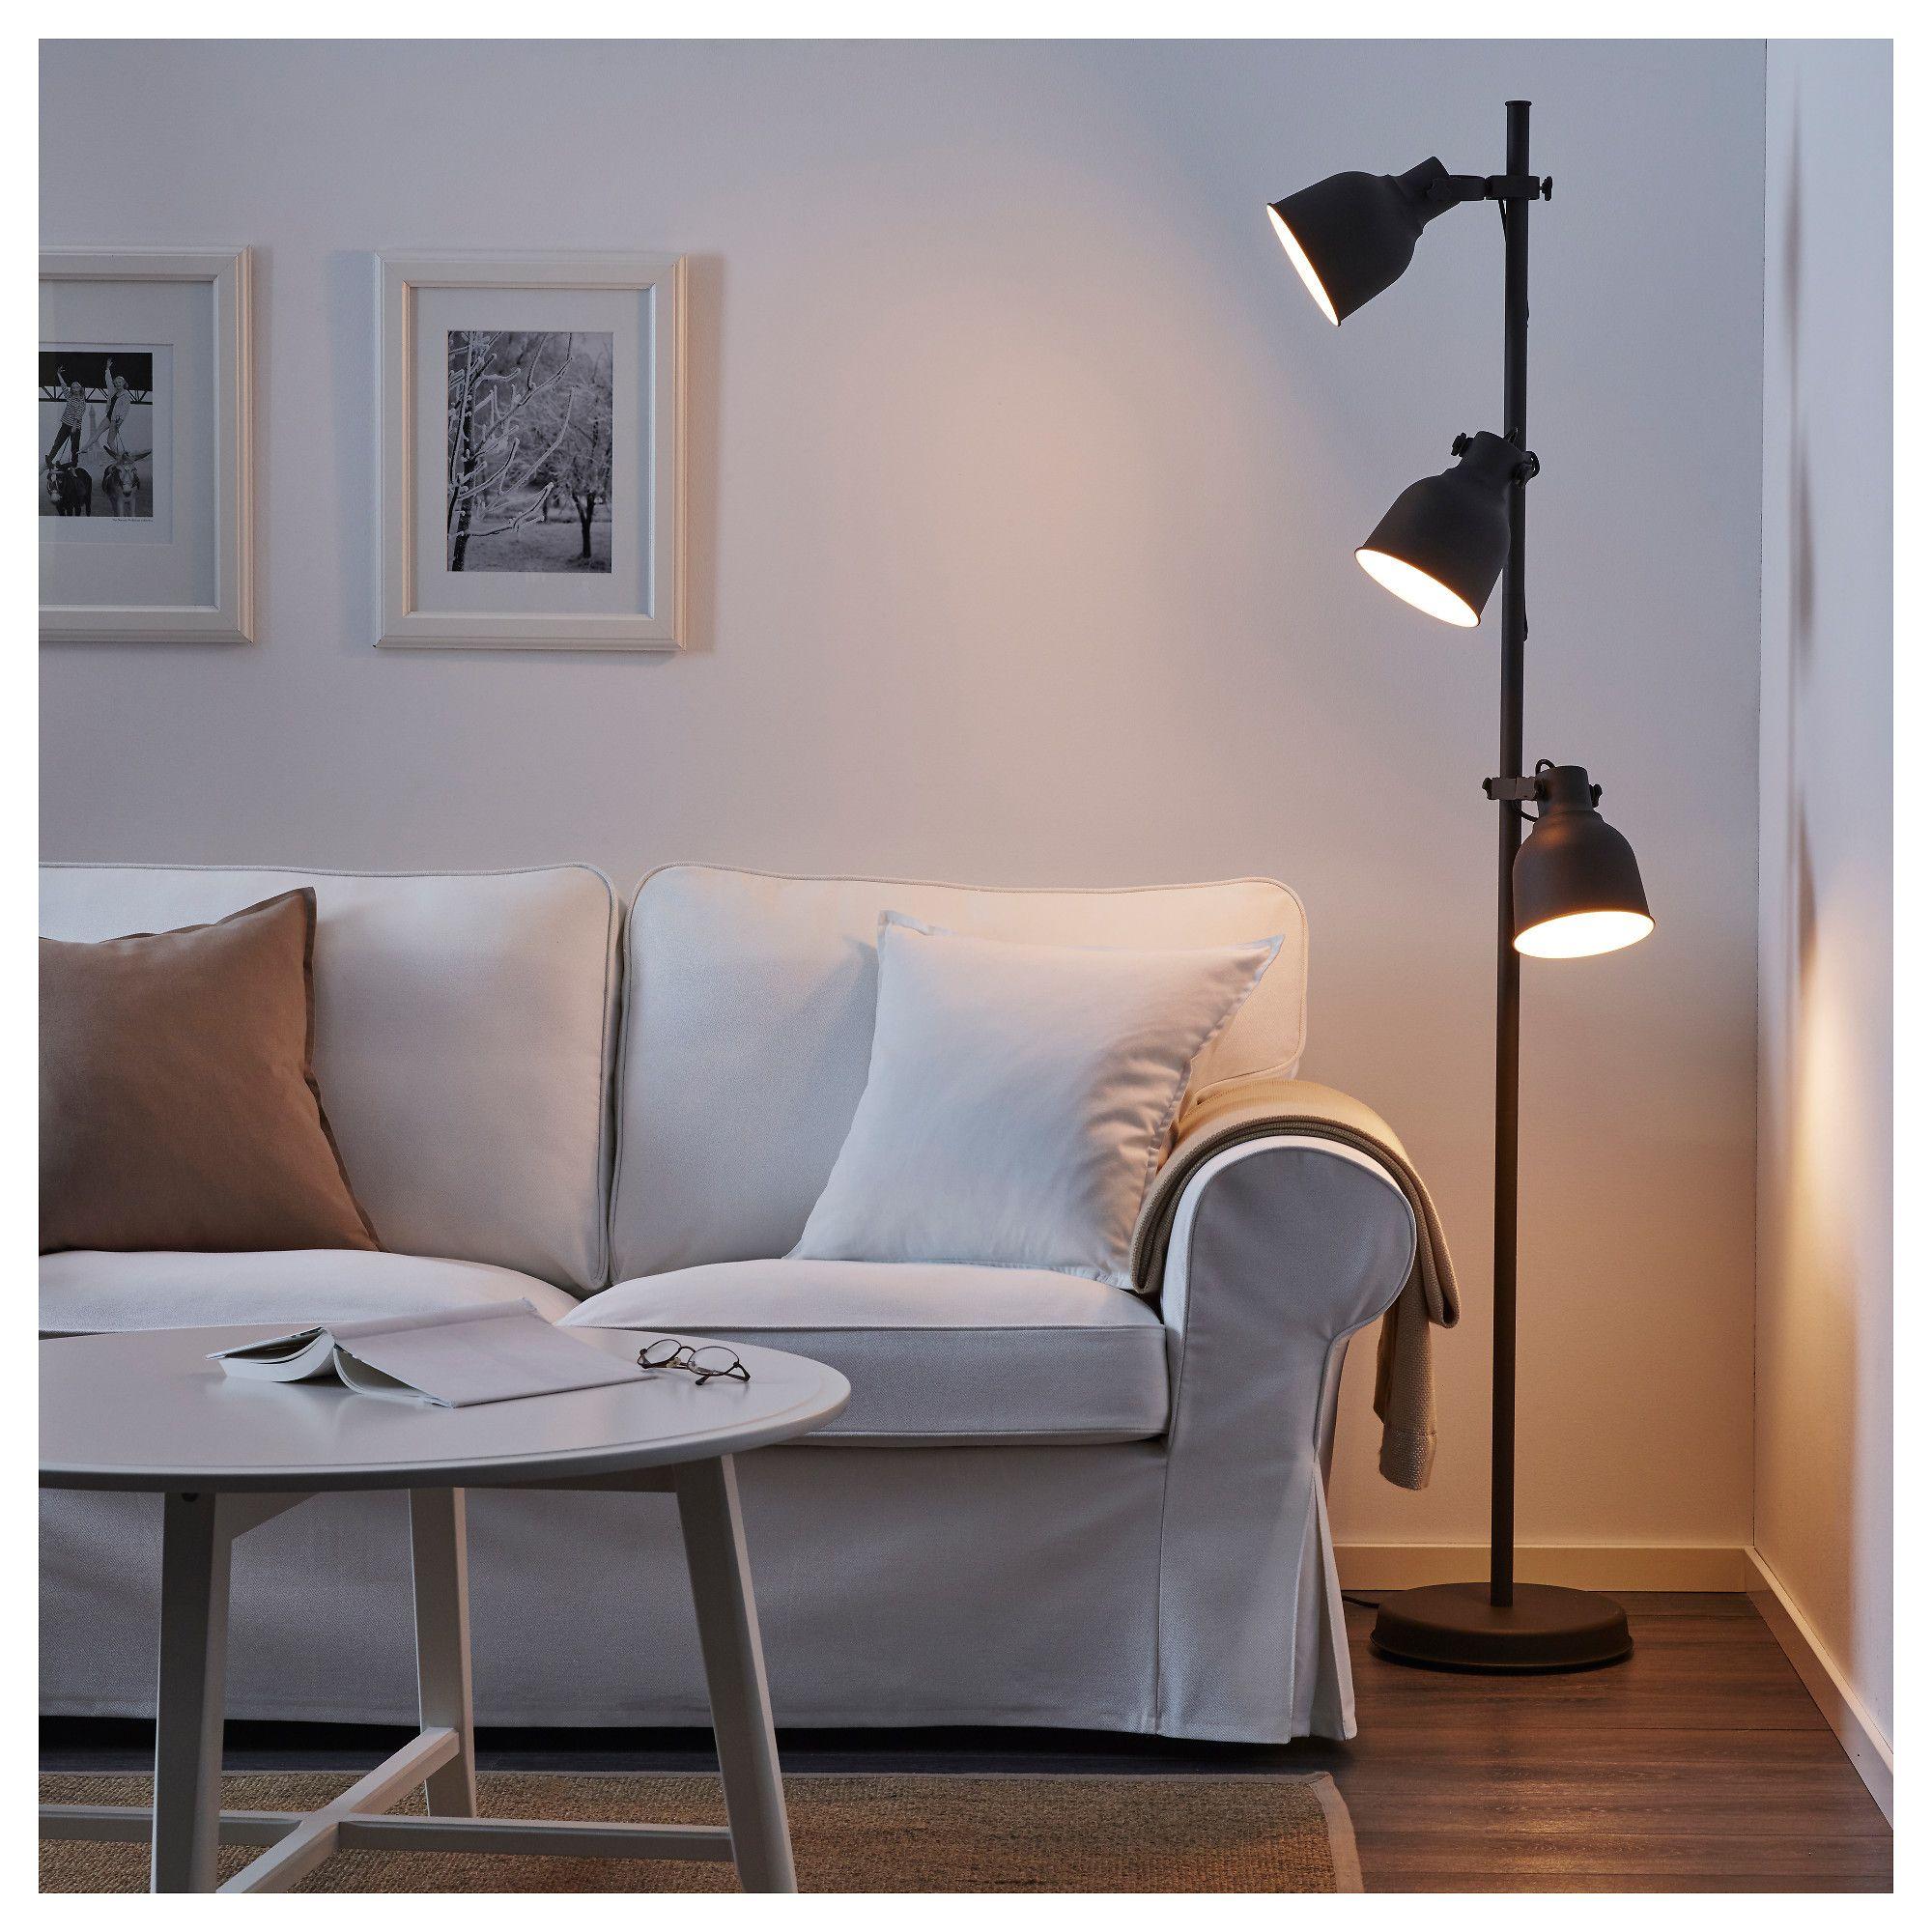 floor Shop Shop FurnitureHome for AccessoriesMoreIkea for LUGMzVqSp